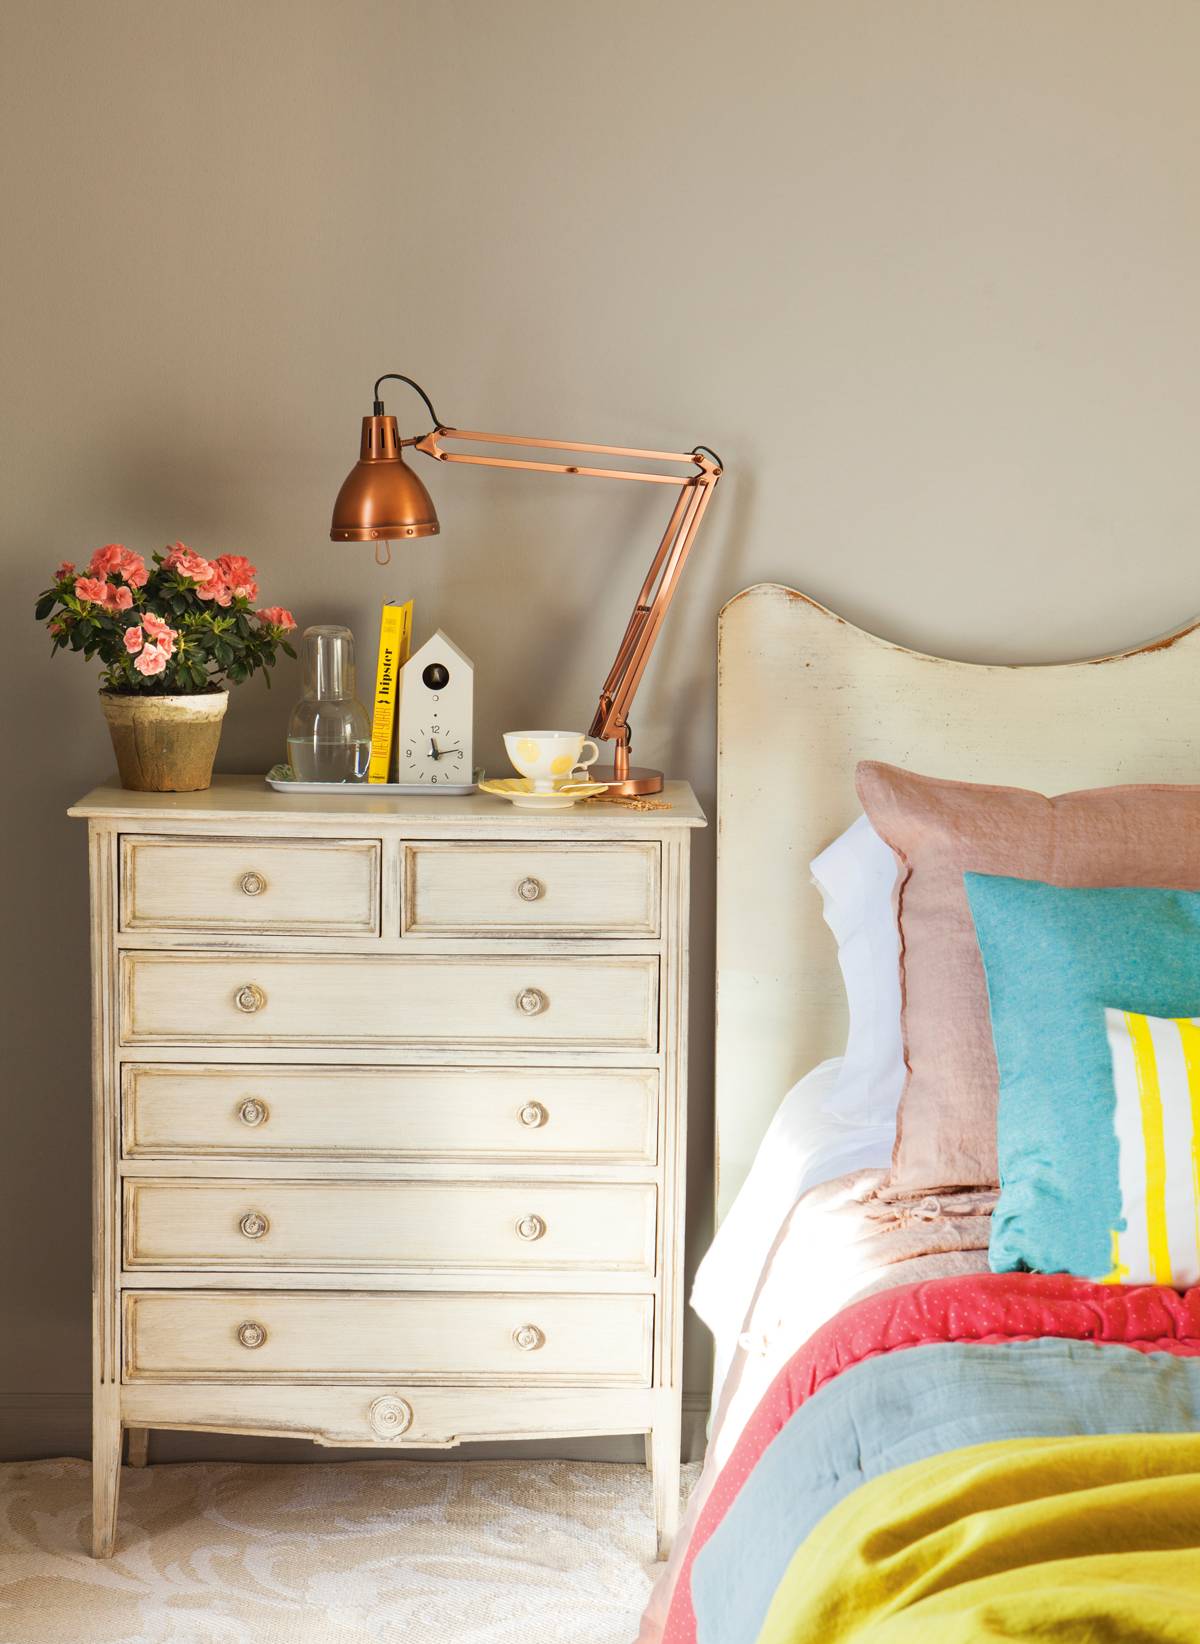 10 piezas imprescindibles para casas peque as for Casas pequenas y comodas